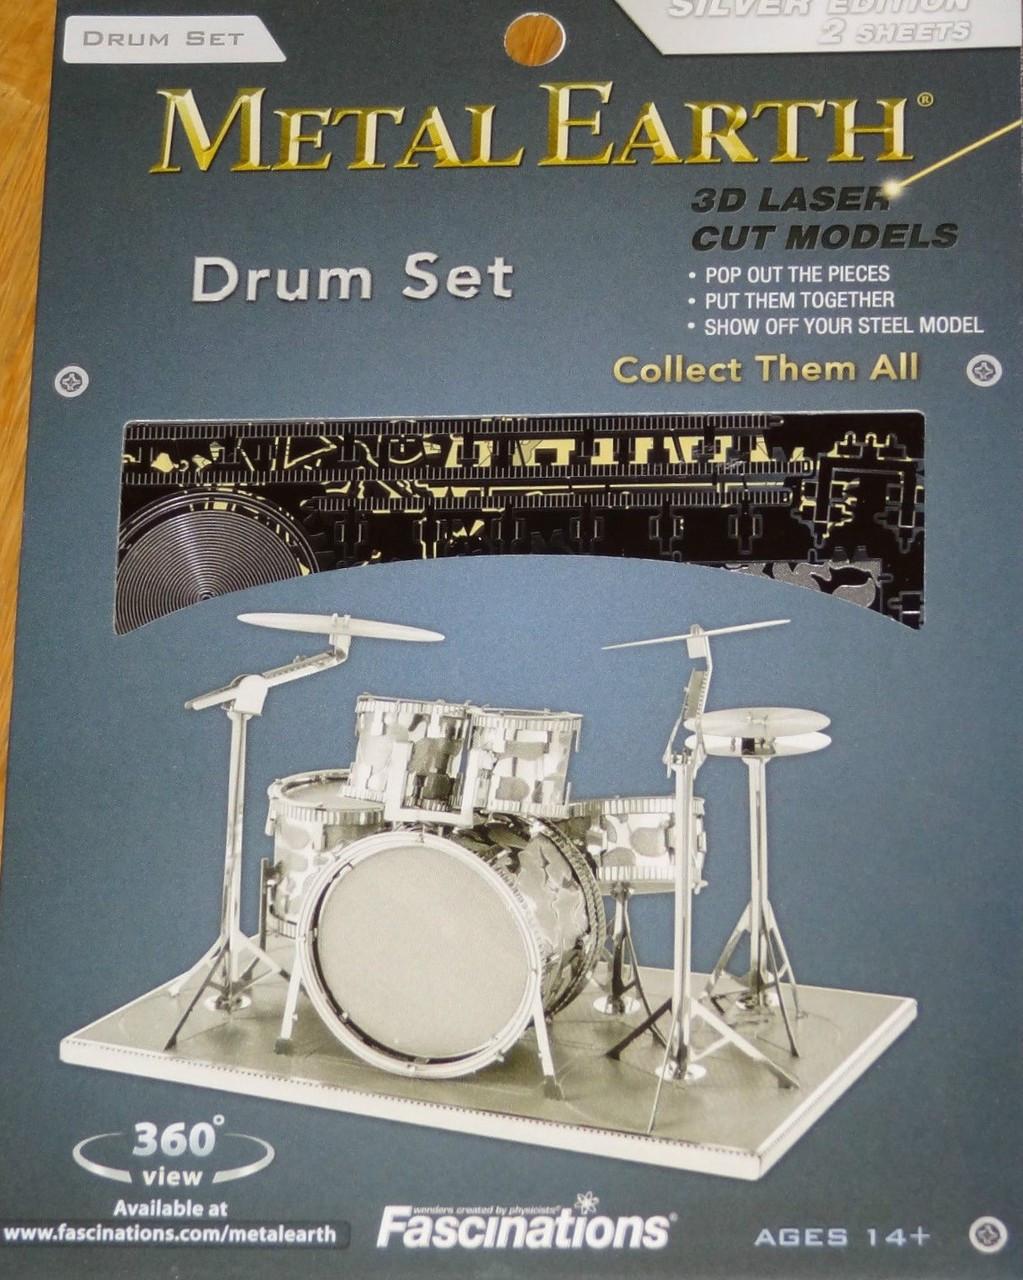 3D Steel Cut Model NEW Fascinations Metal Earth Musical Drum Set